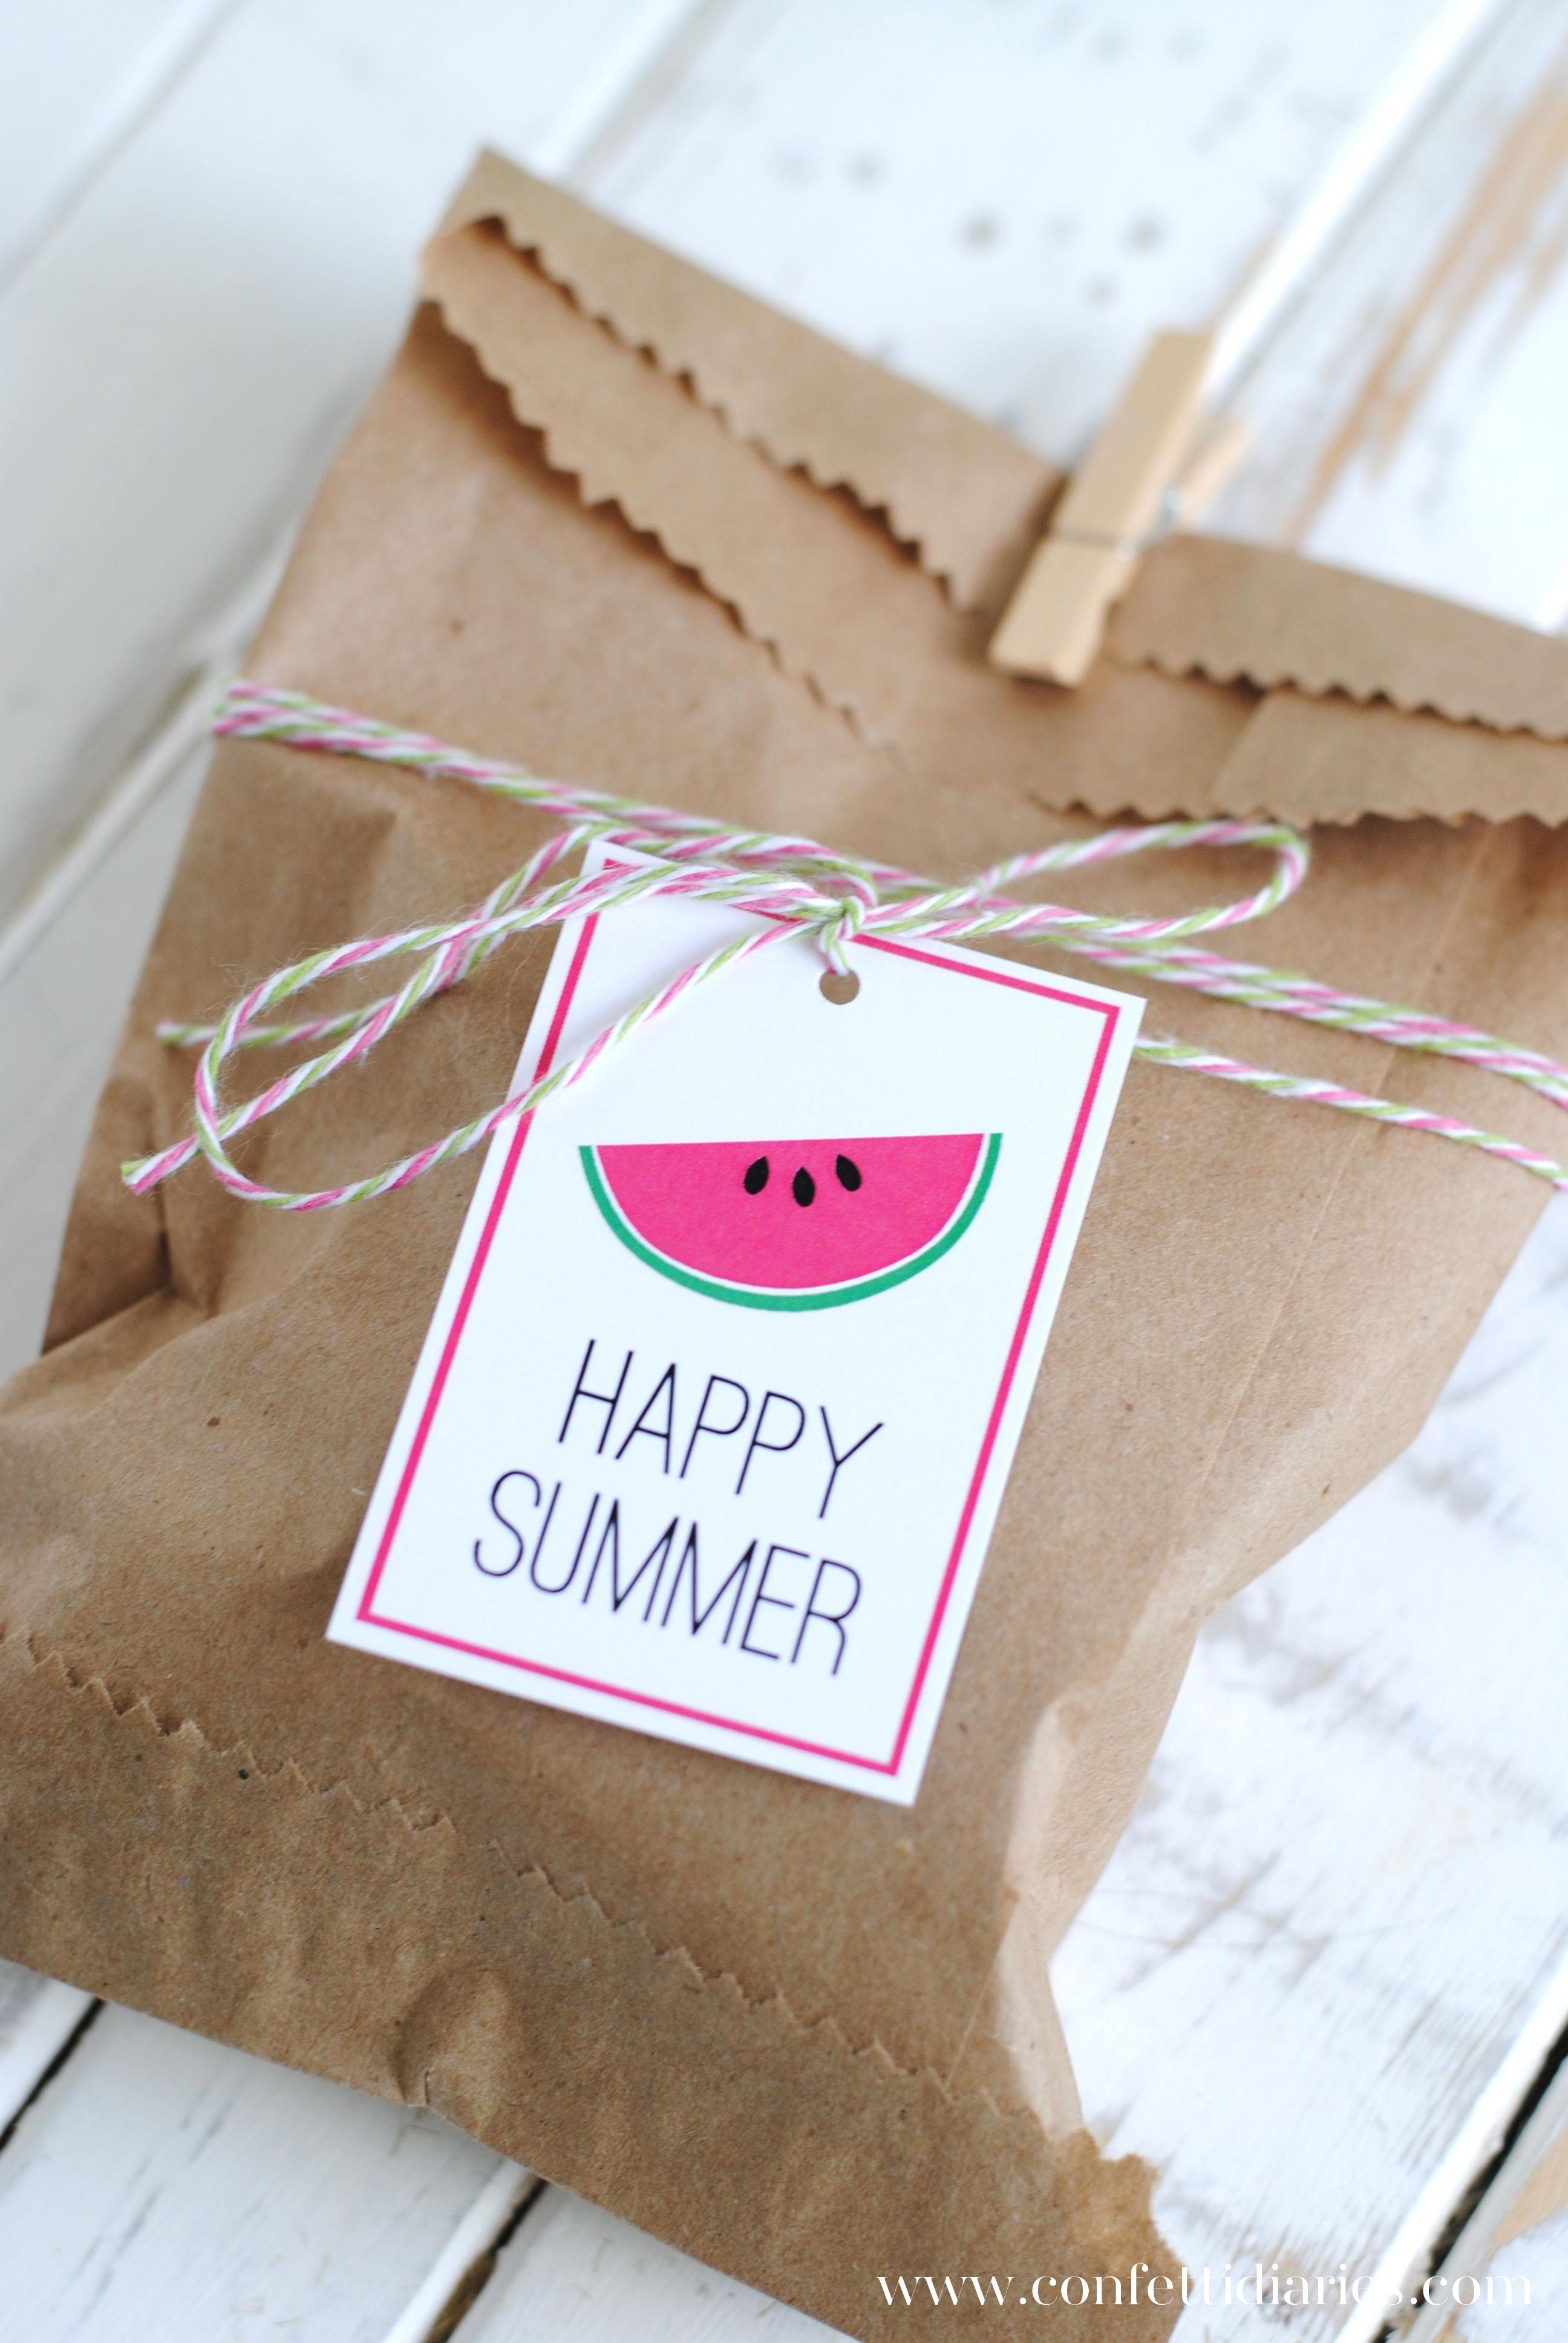 Free Printable Happy Summer Gift Tags - Katarina's Paperie - Free Printable Goodie Bag Tags